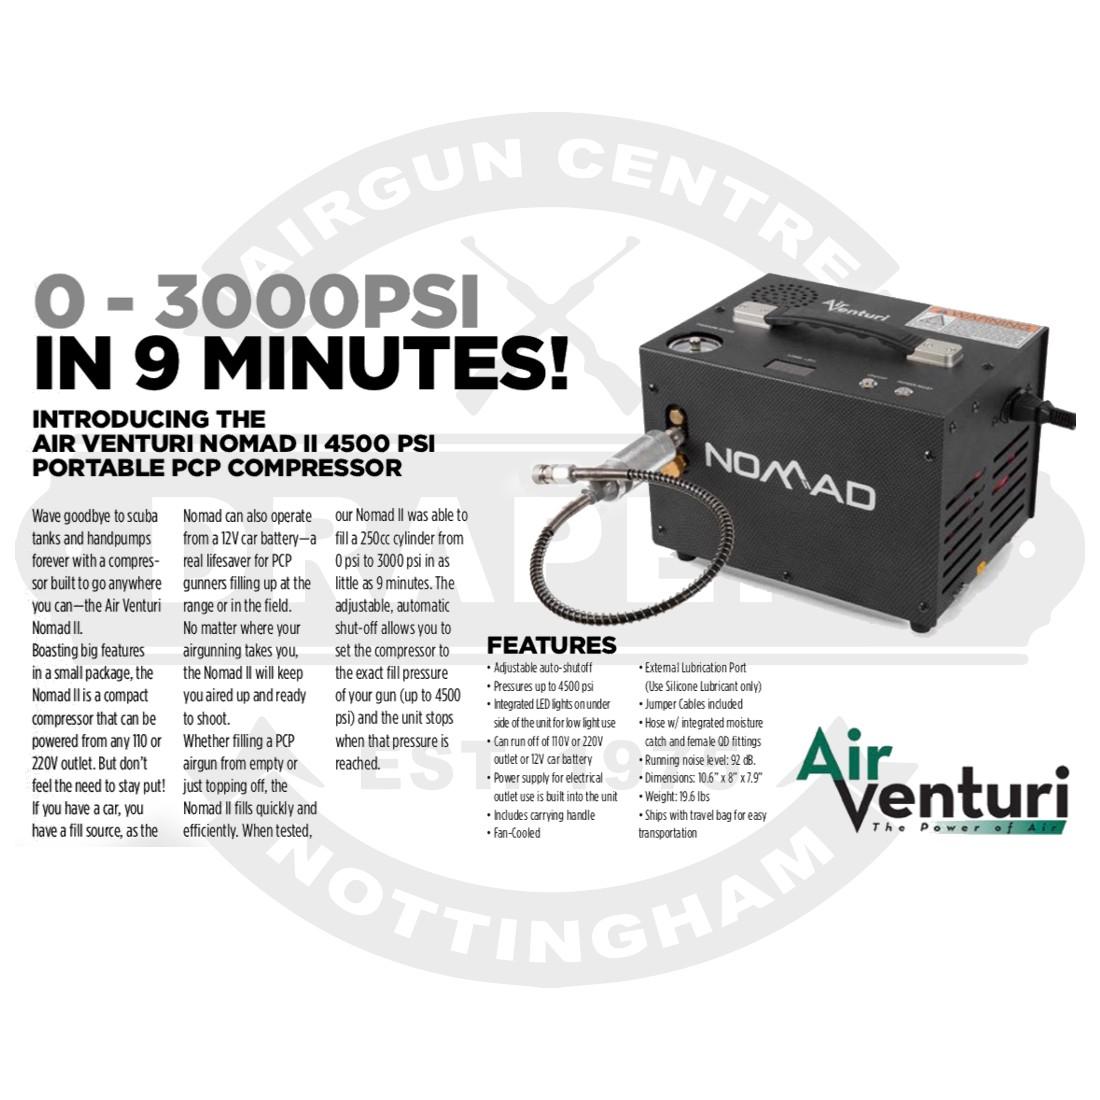 Air Venturi Nomad Ii 4500psi Portable Pcp Compressor